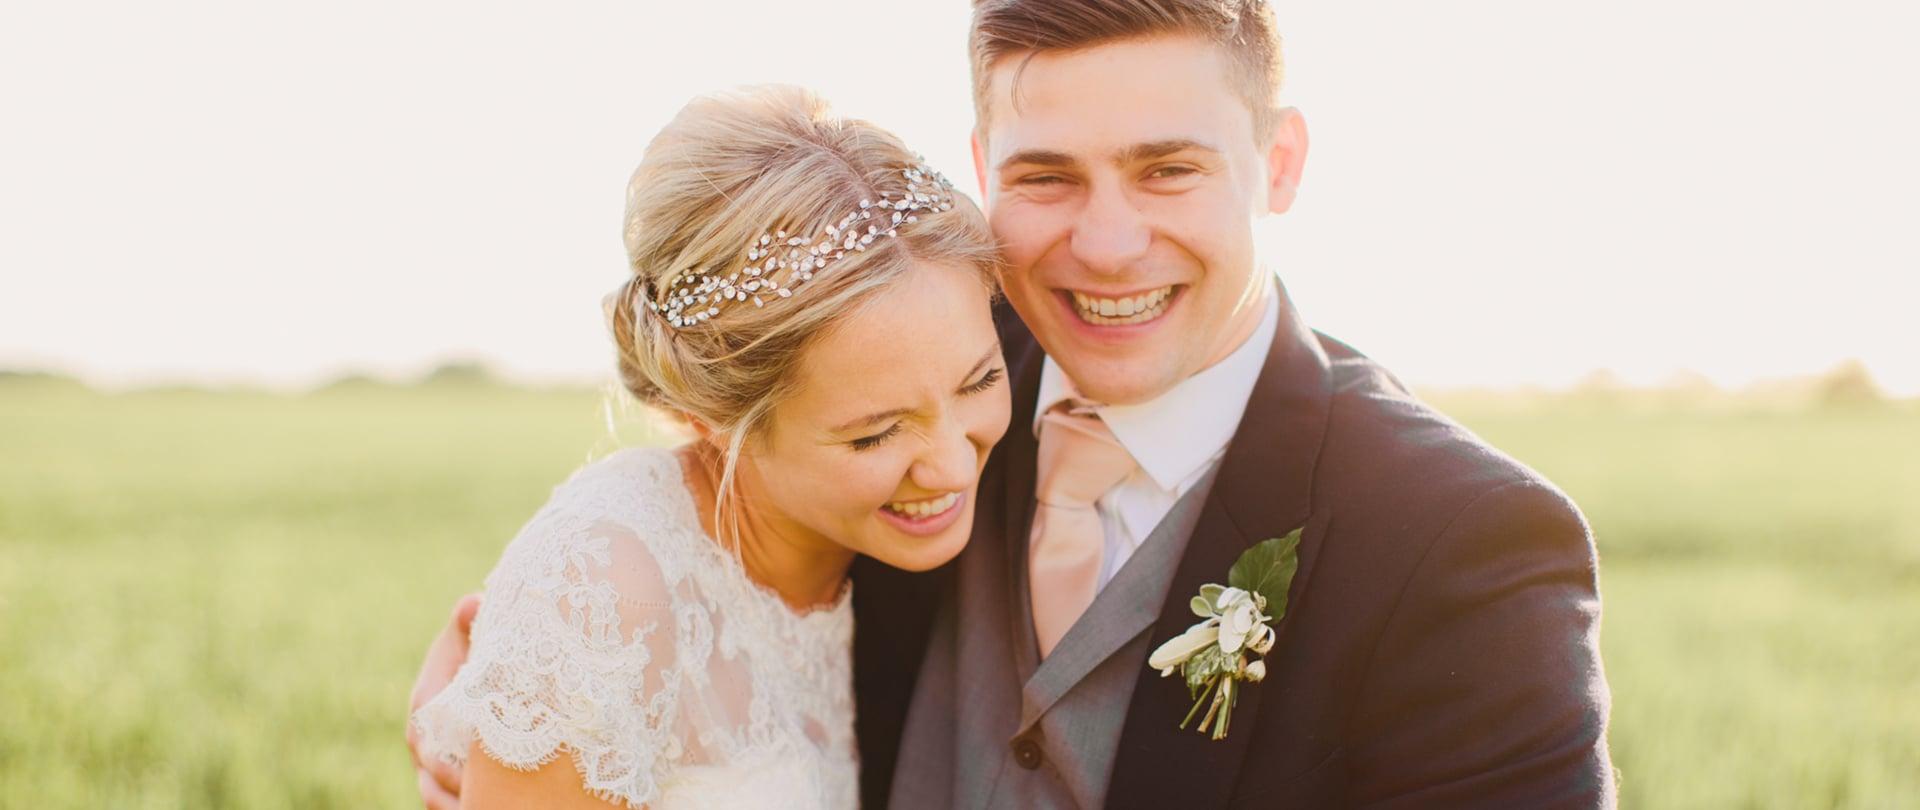 Charlotte & Ben Wedding Video Filmed at Norfolk, England